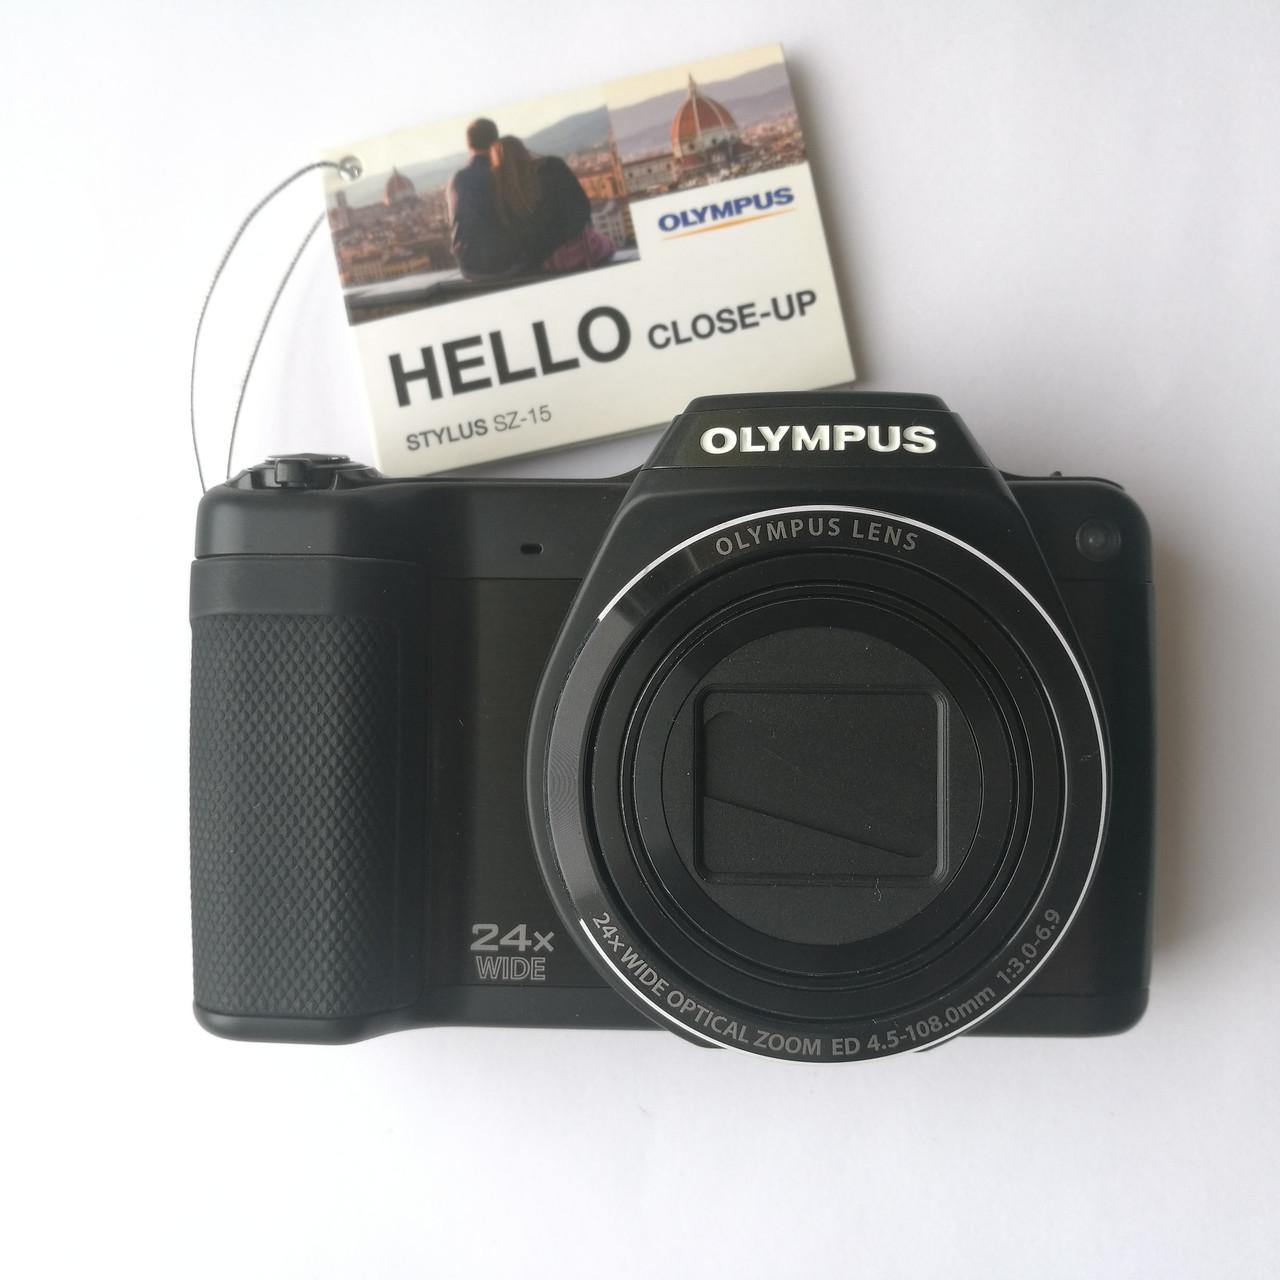 low priced 23998 5a866 Фотоаппарат OLYMPUS STYLUS SZ-15 Black Б У - Интернет-магазин компьютерной  техники